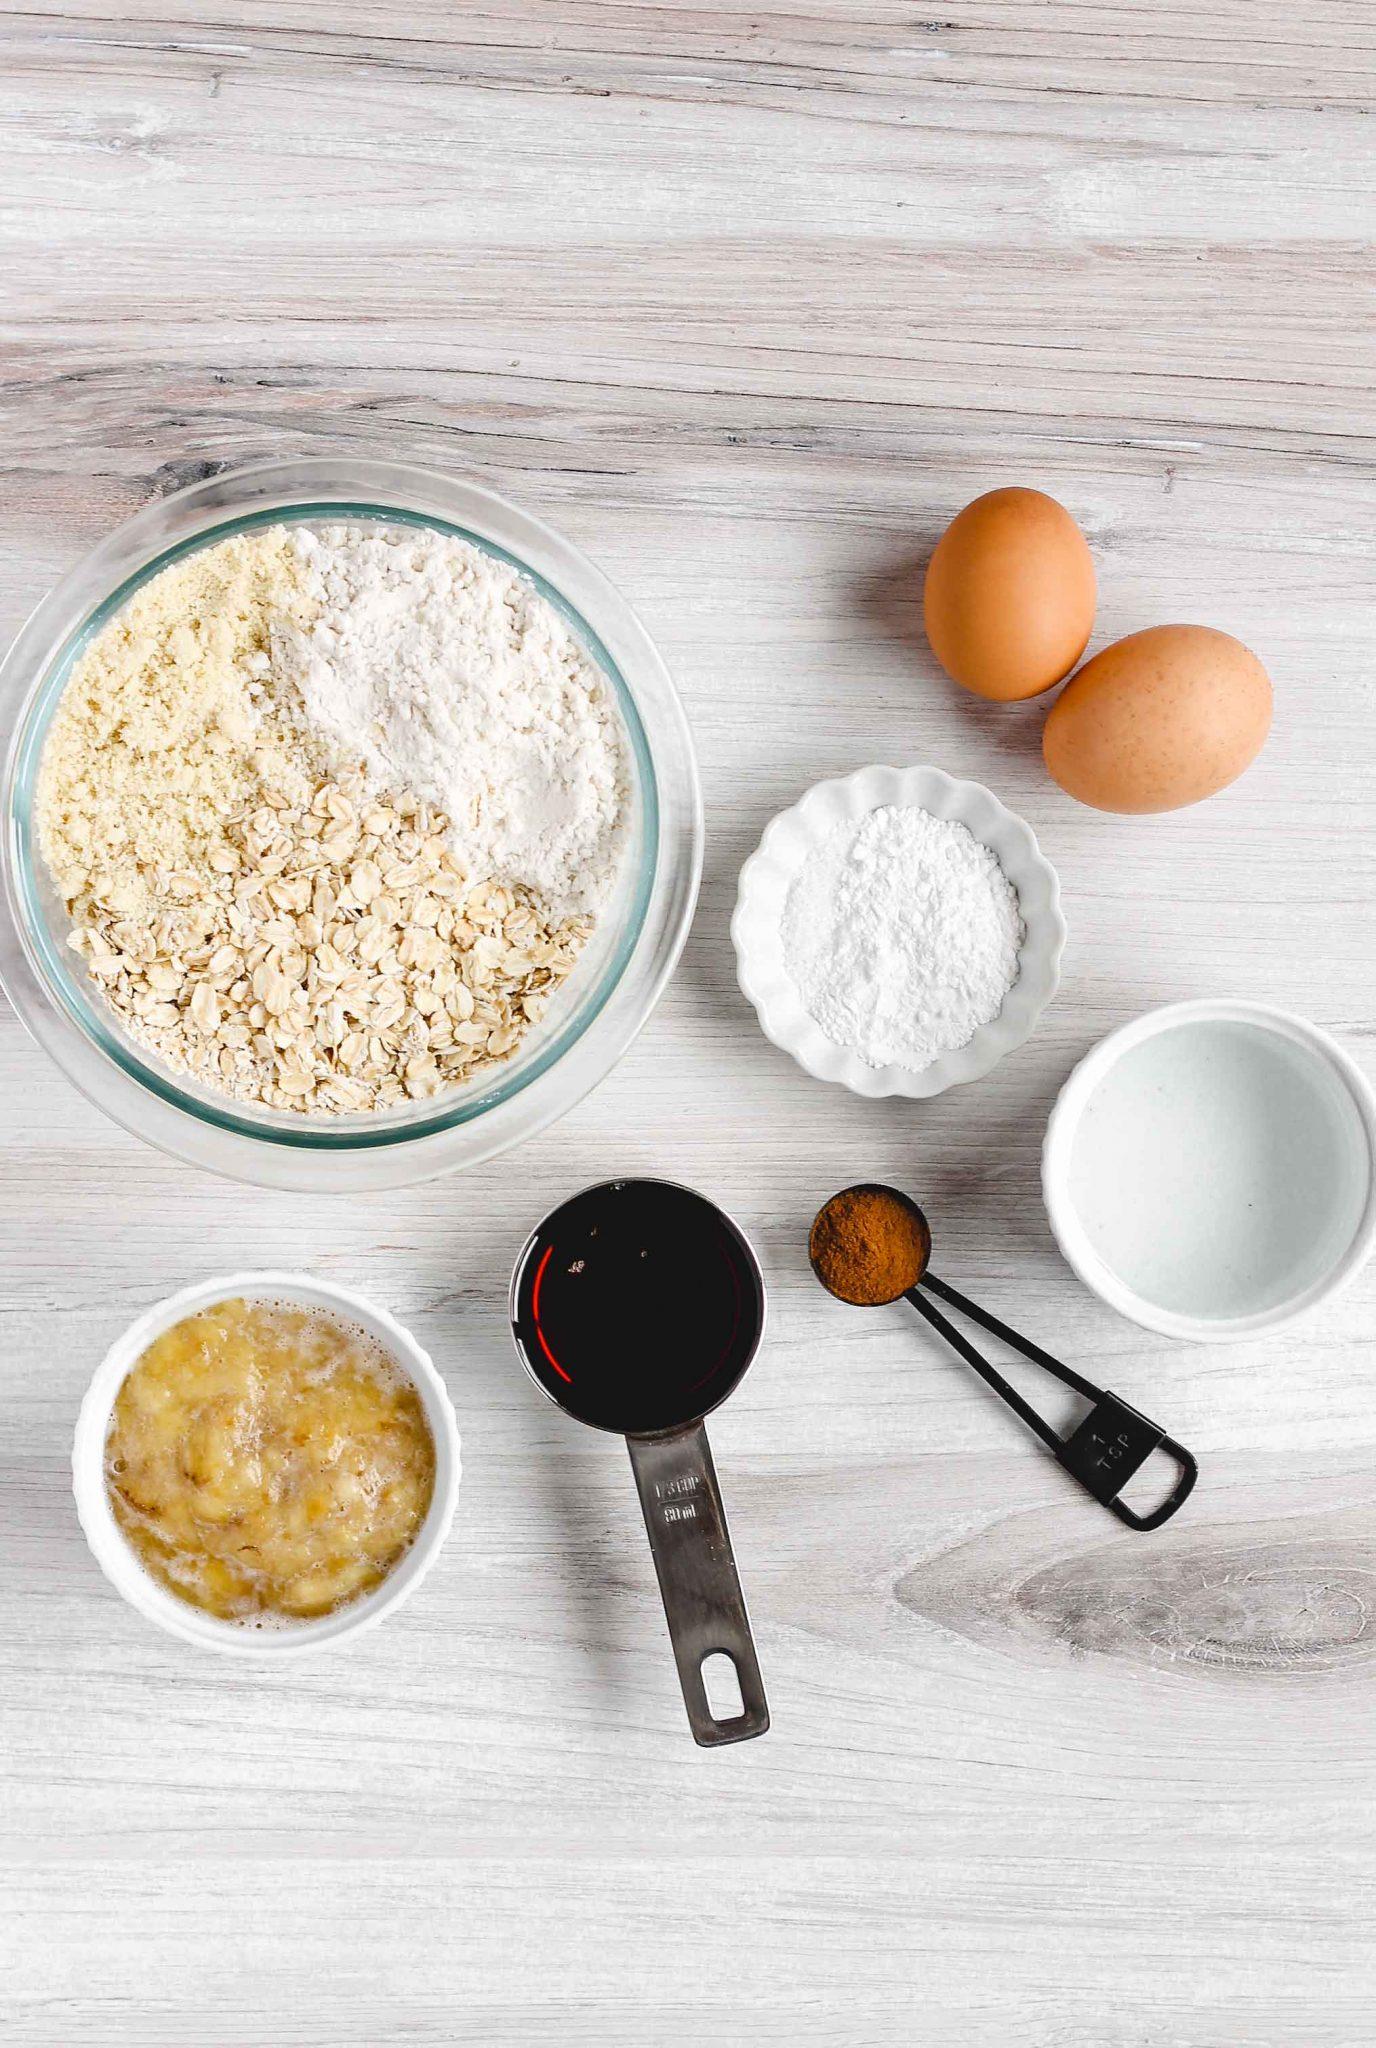 ingredients used to make banana muffins